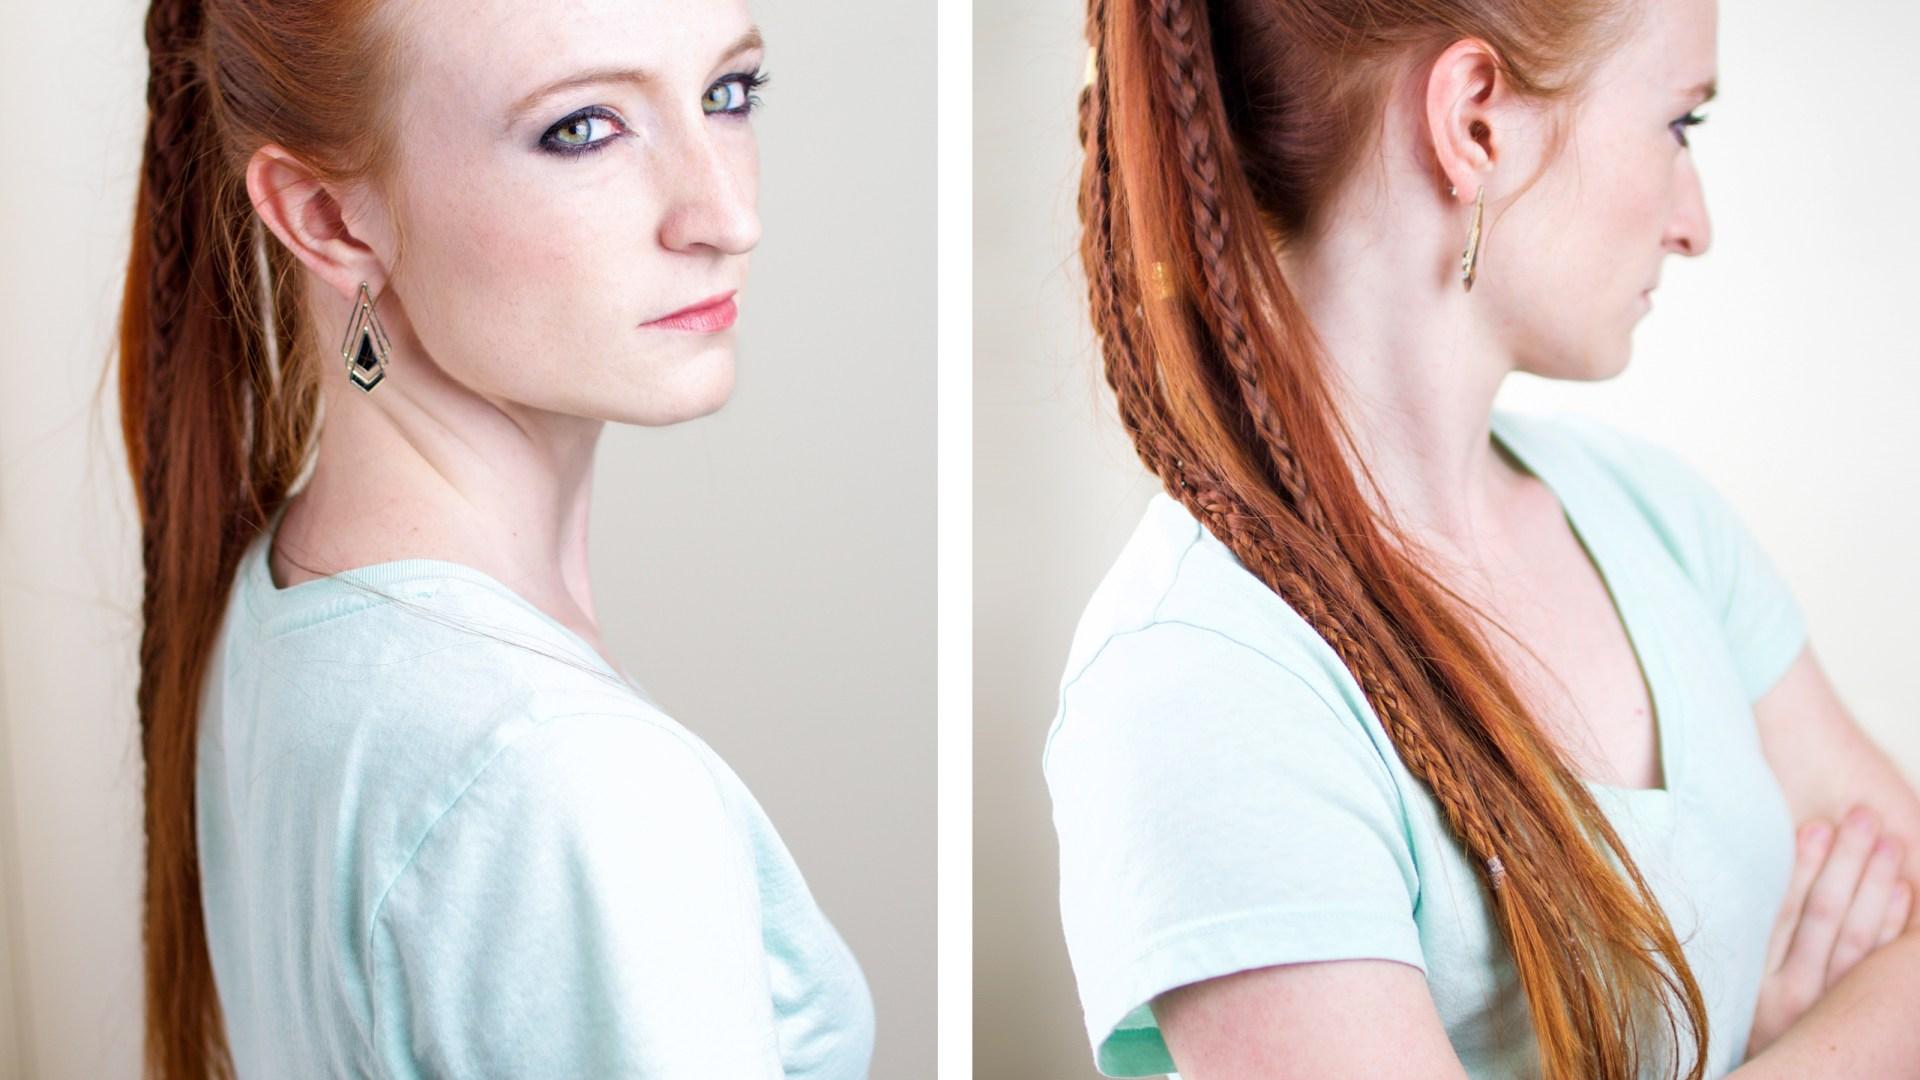 Torvi the Shieldmaiden – Braided Hairstyles